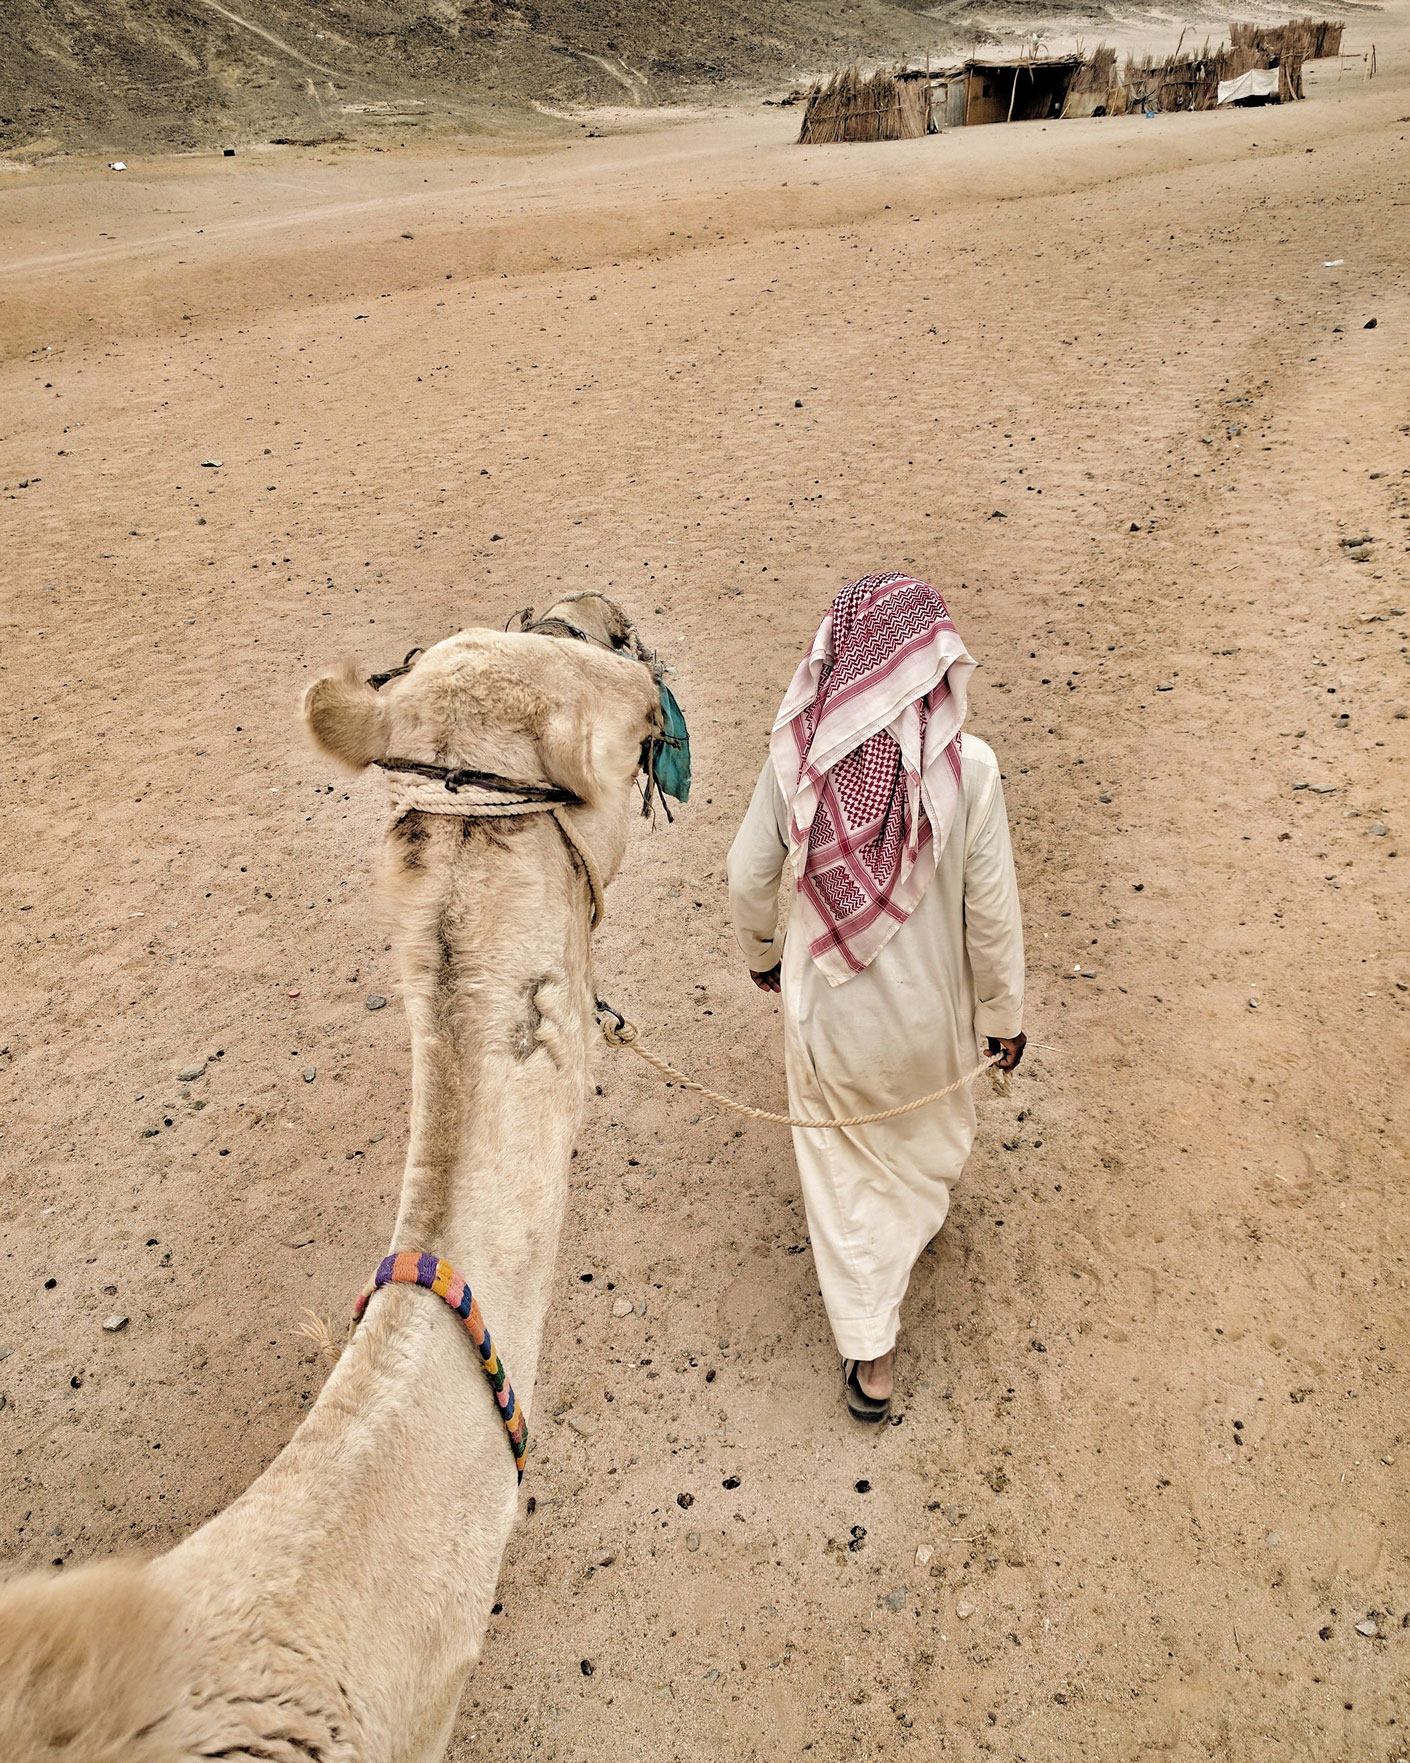 Bedouin leading a camel ride in the desert outside Hurghada, Egypt